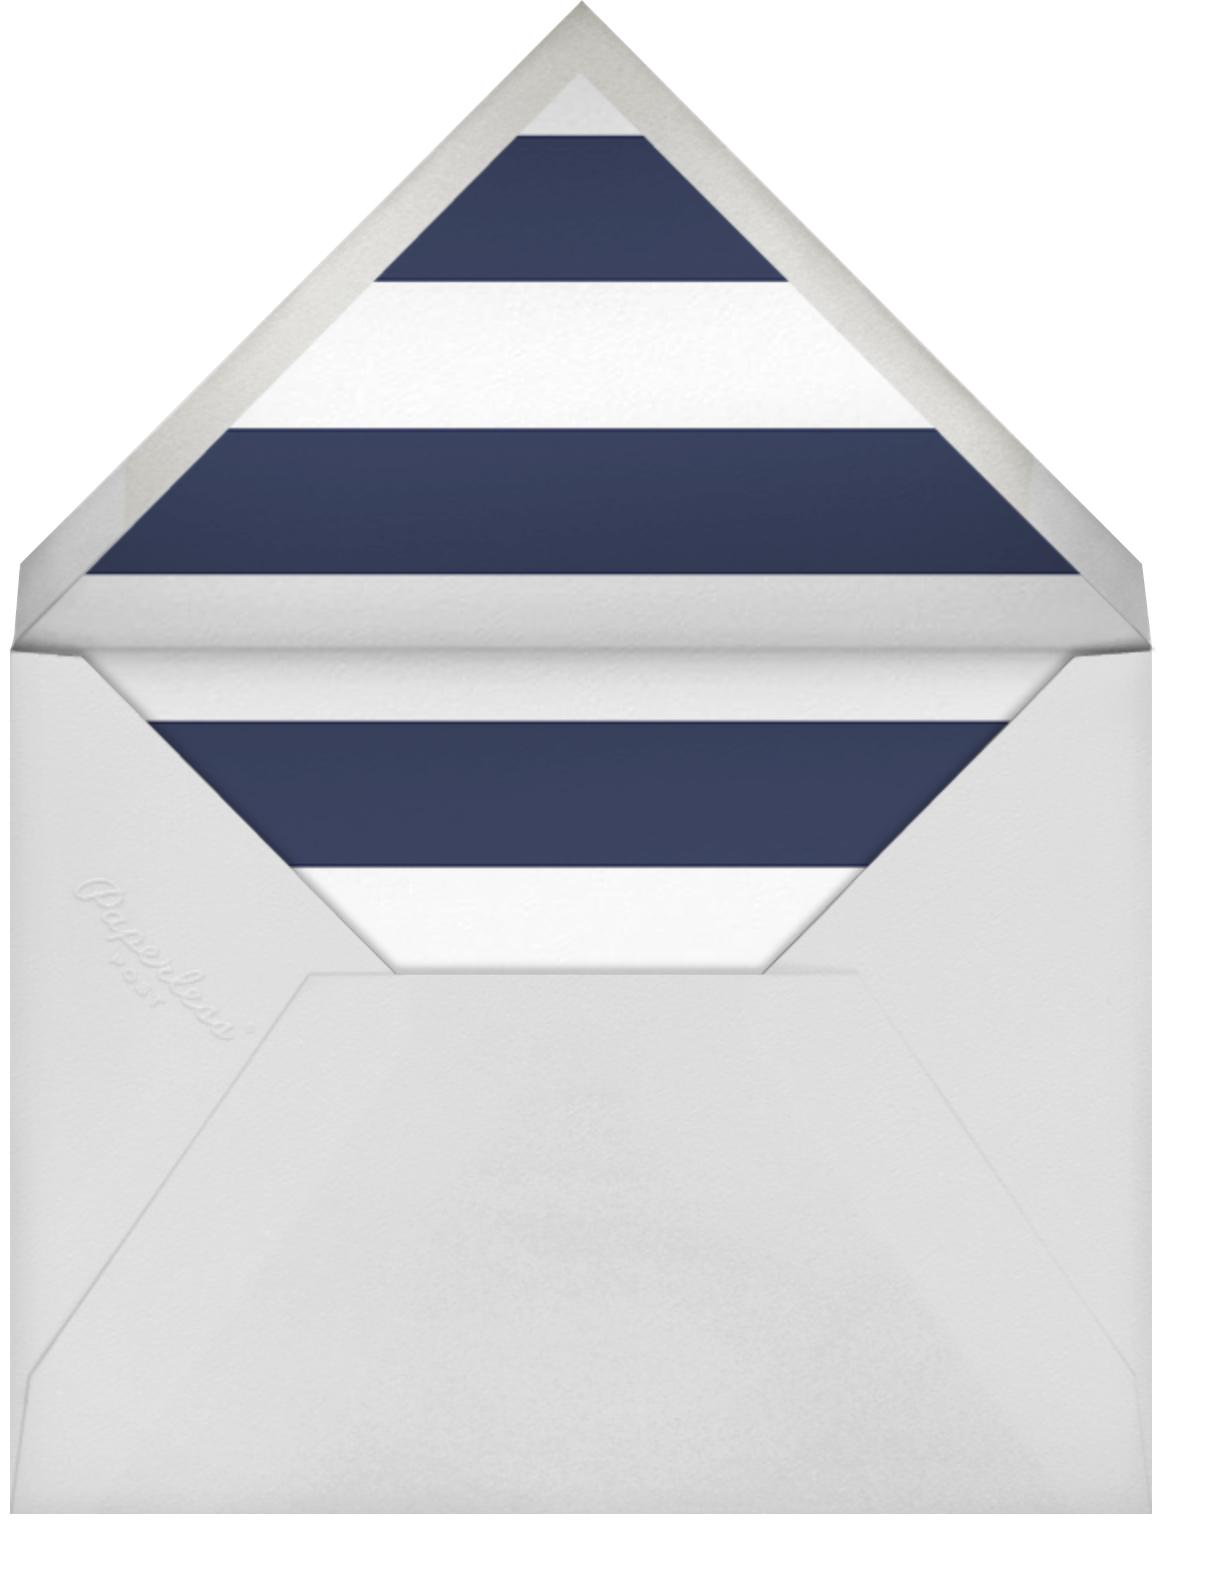 Stripe Suite (Invitation) - Navy - kate spade new york - Bat and bar mitzvah - envelope back